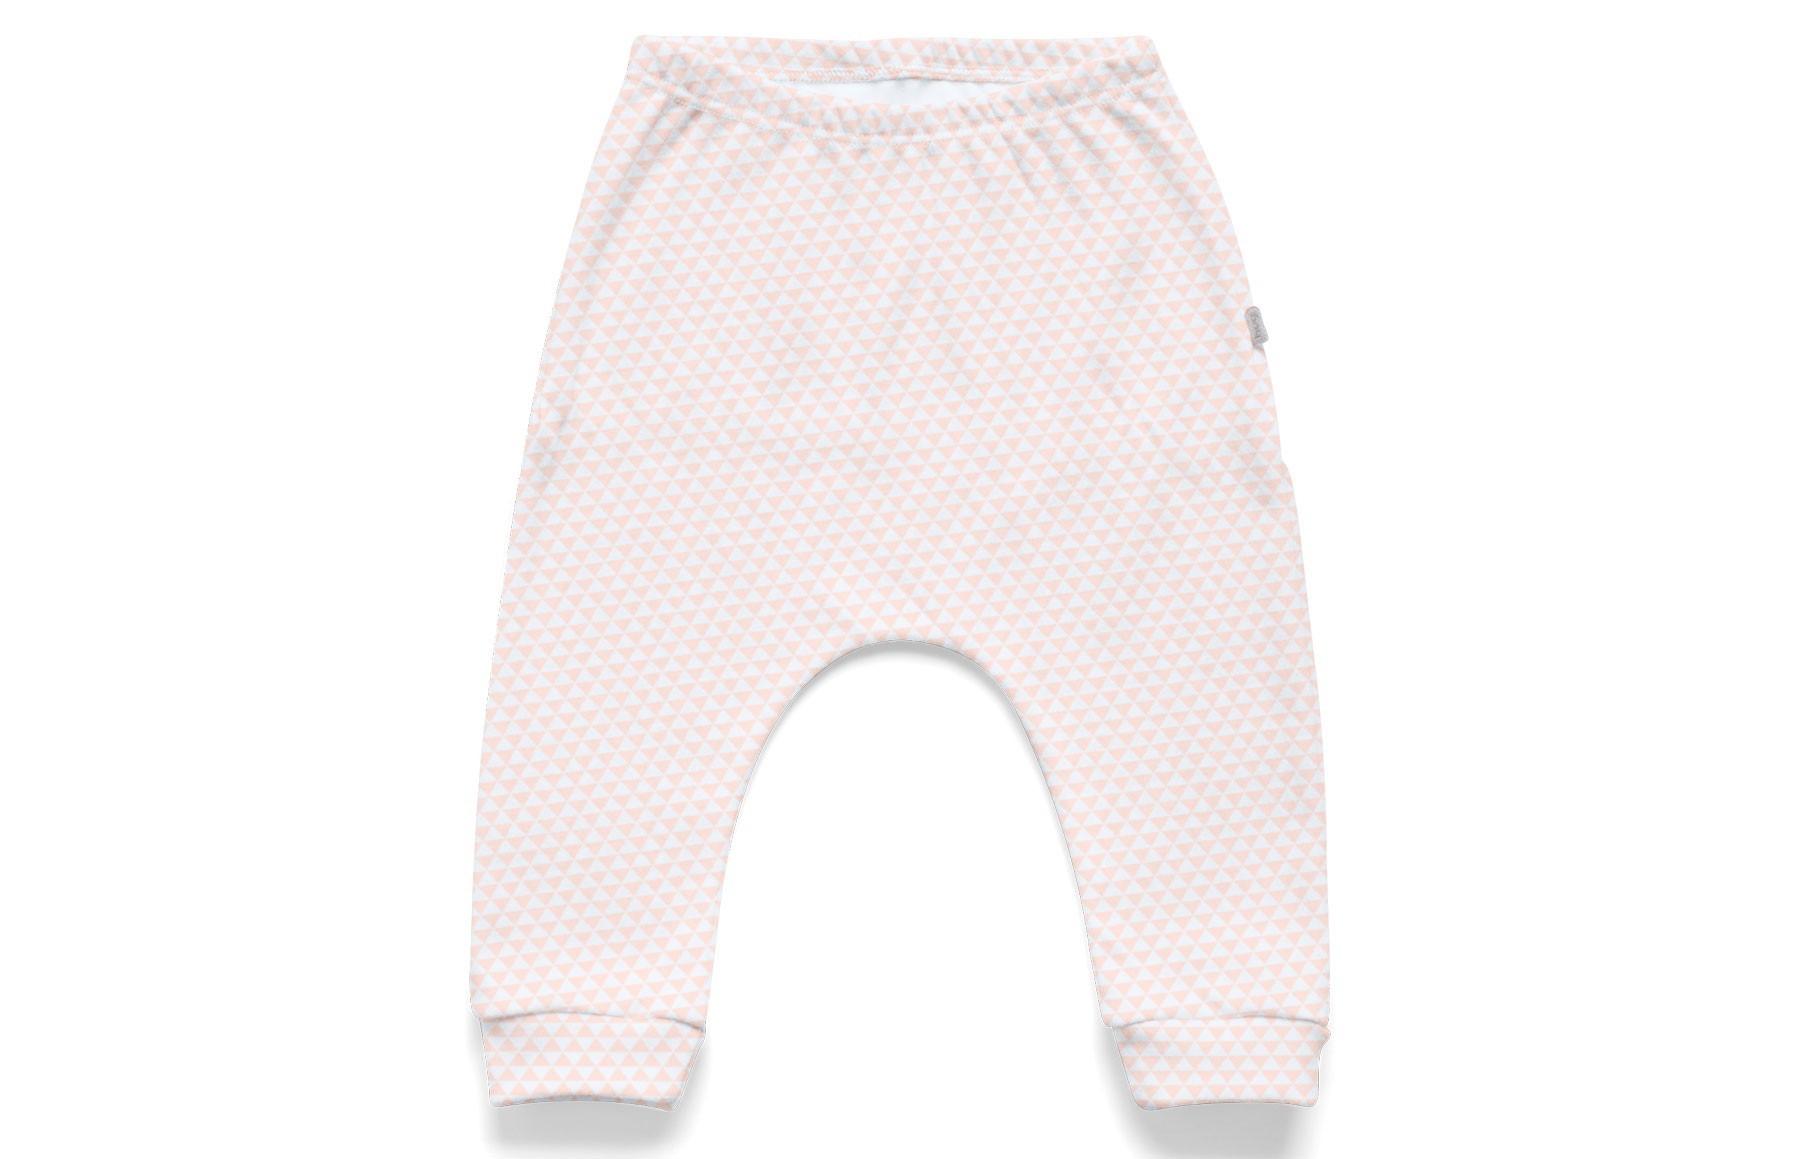 Kit Body Longo + Calça + Bandana - Lembrança de Infância Rosa